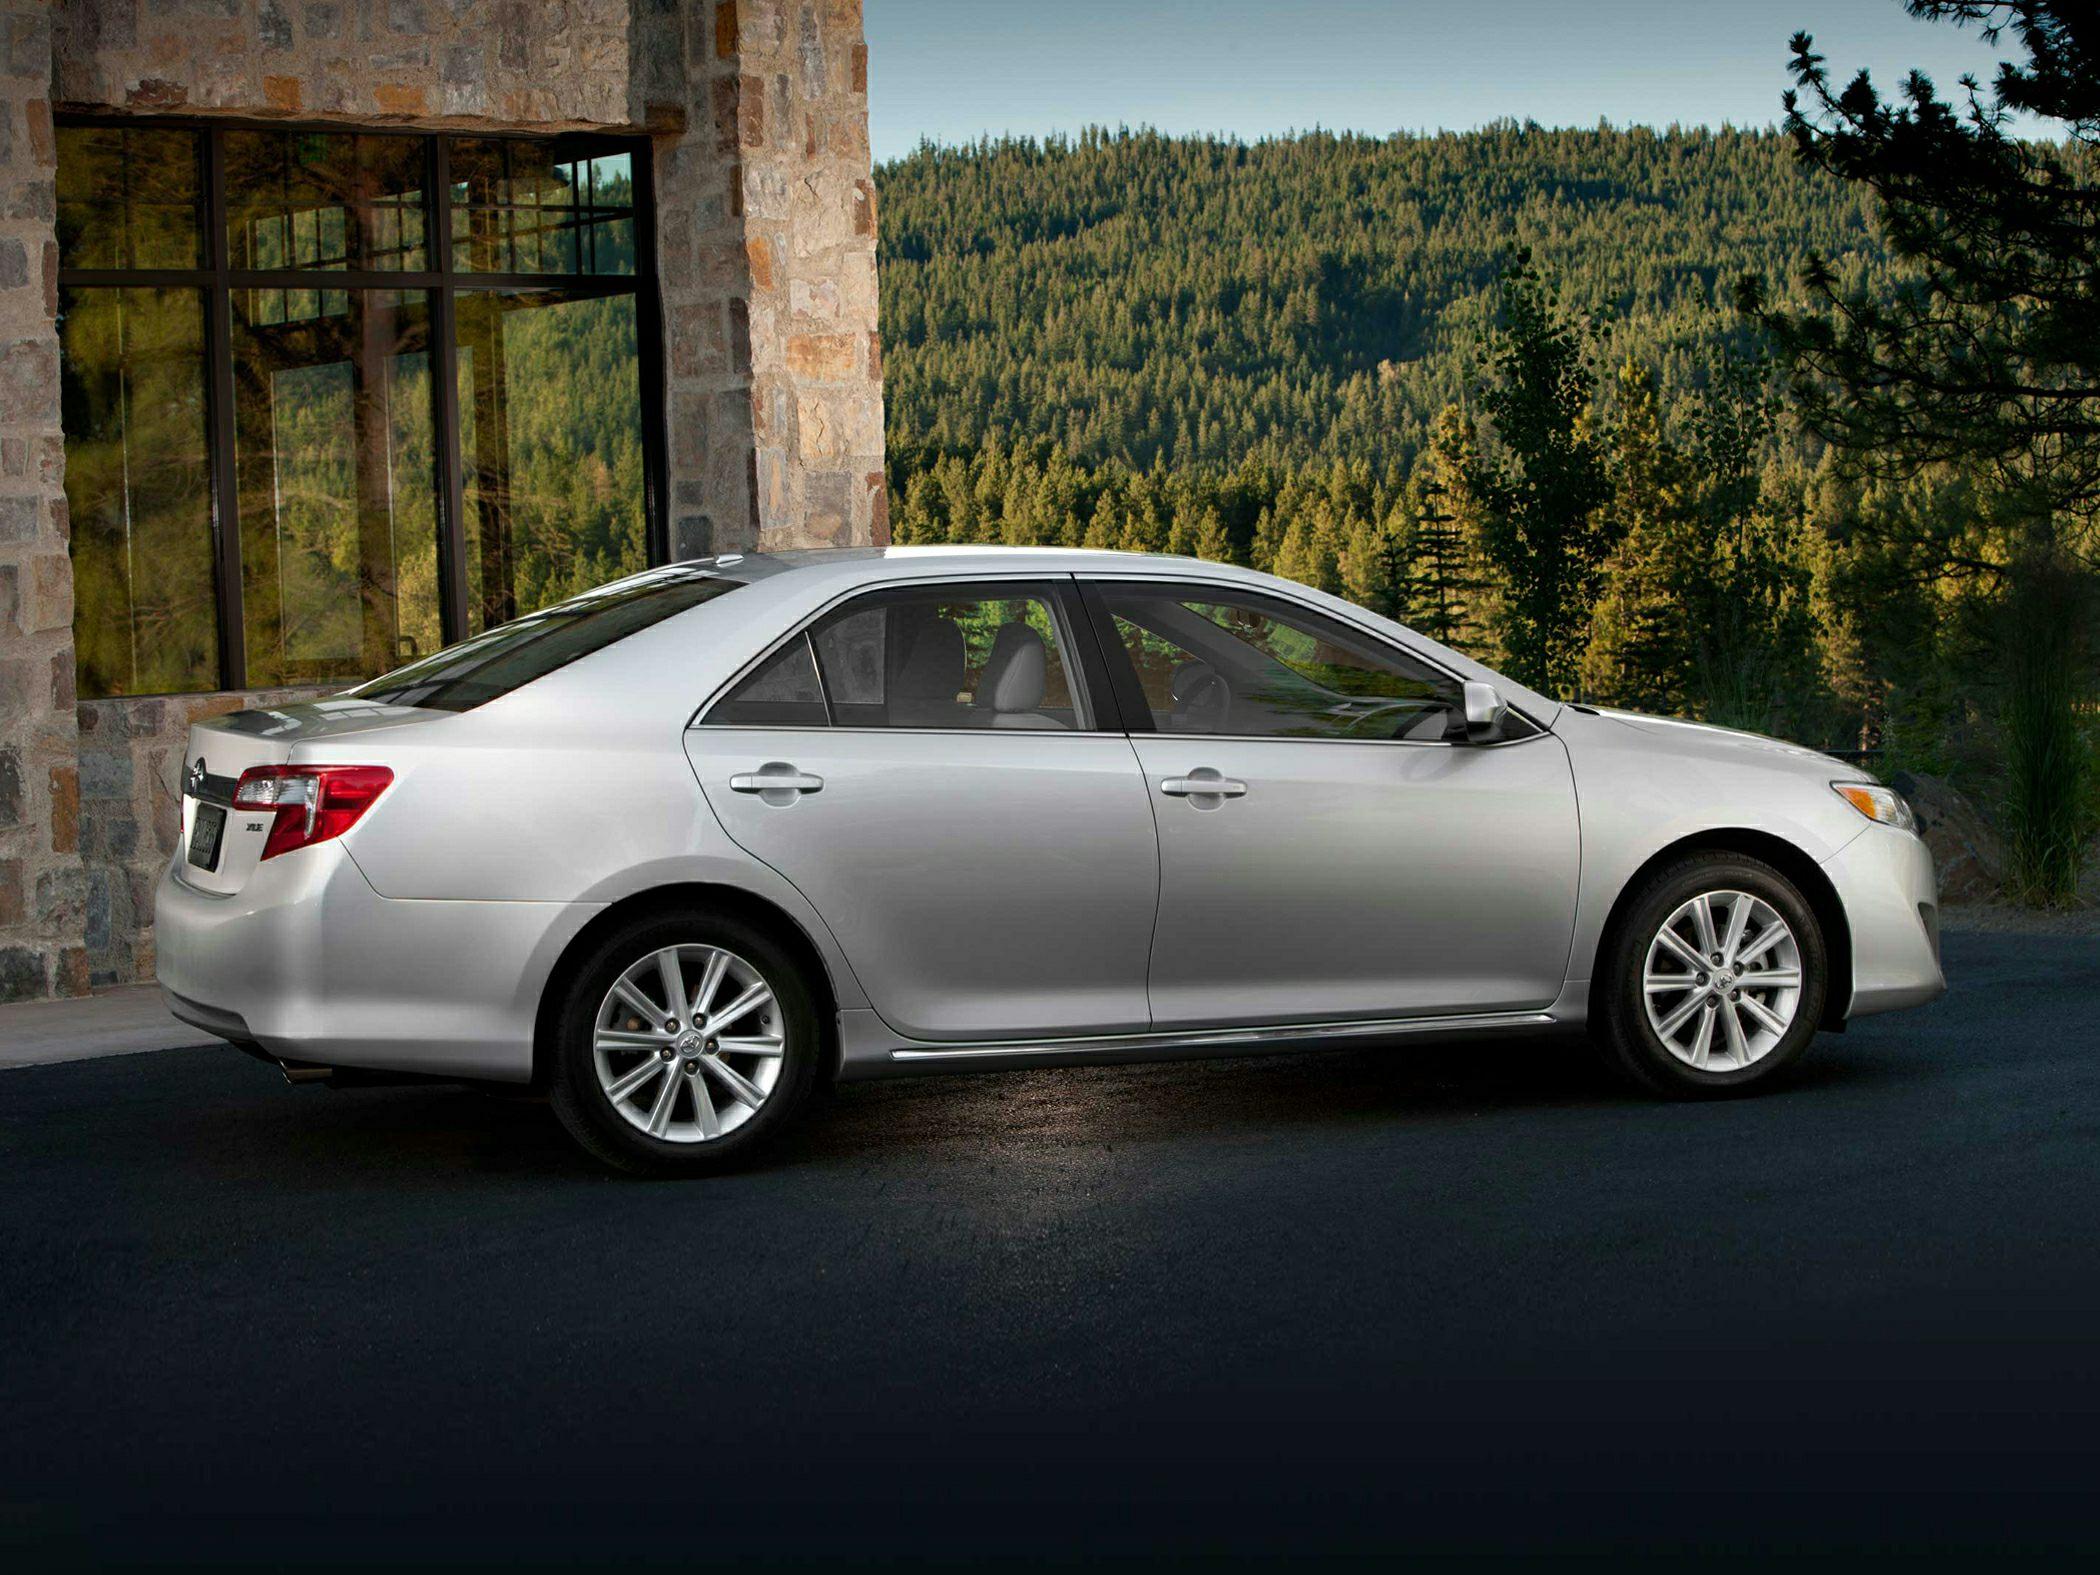 ������� ���� ٢٠١٤ ����� ���� 2014-Toyota-Camry-Sedan-L-4dr-Sedan-Photo-1.jpg